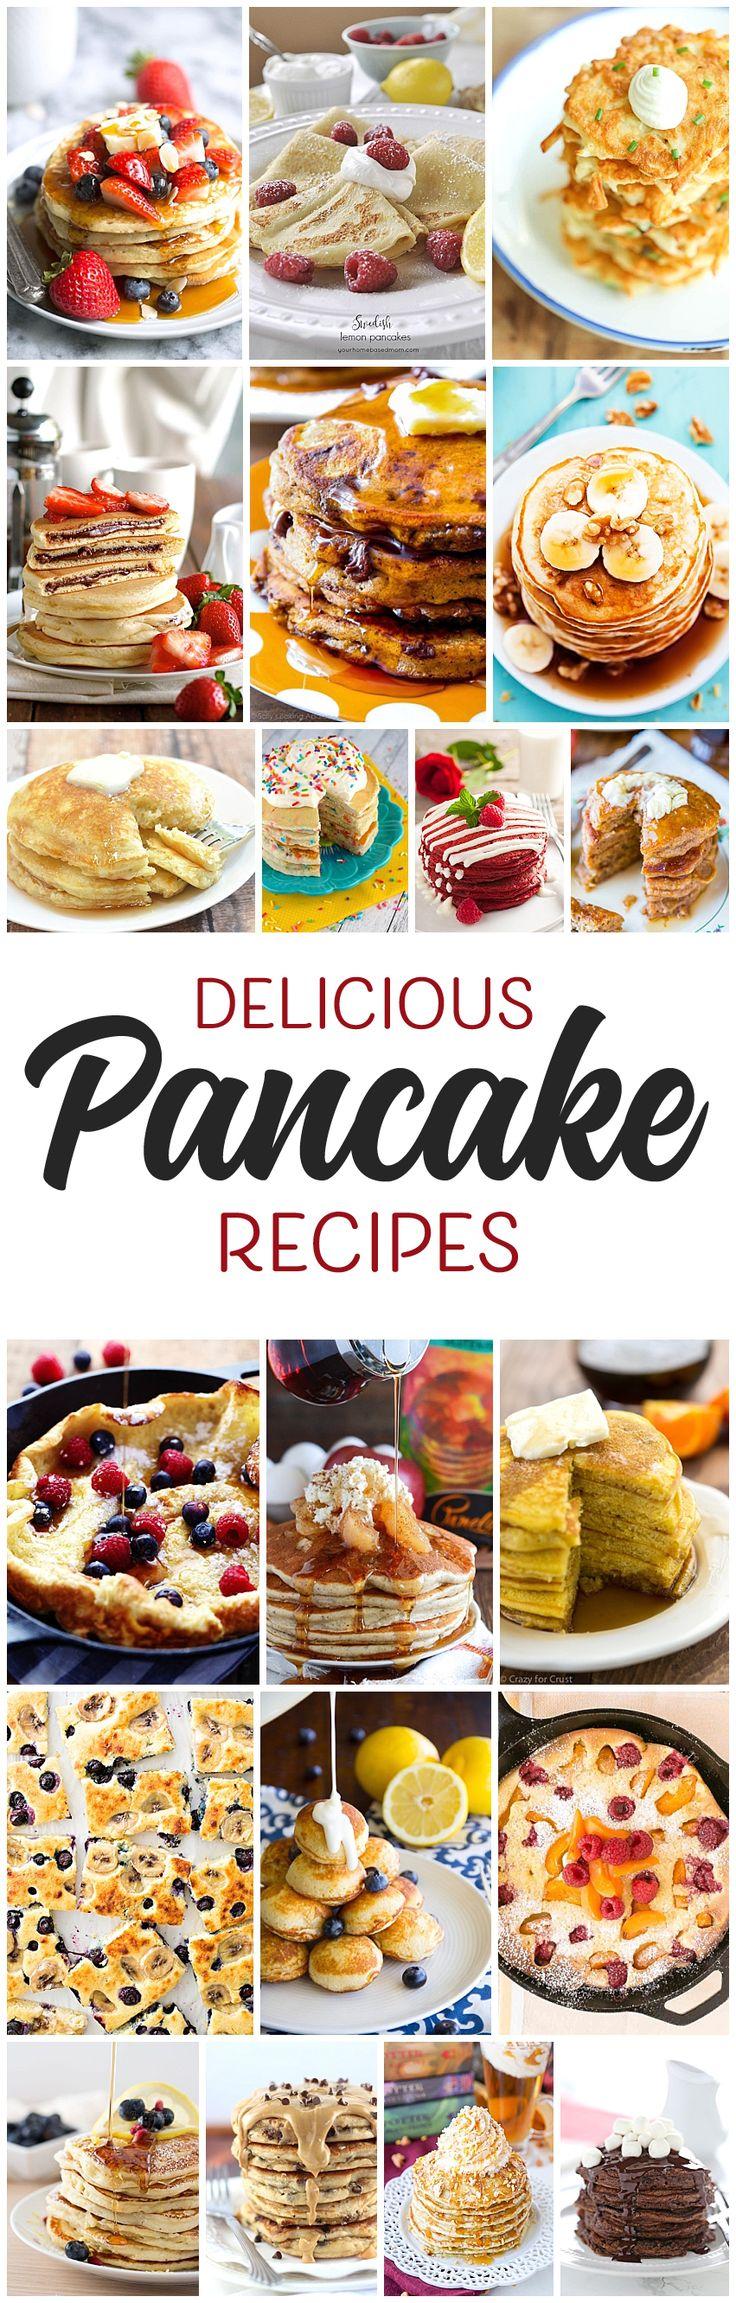 42 best Pancakes images on Pinterest | Pancake recipes, Breakfast ...